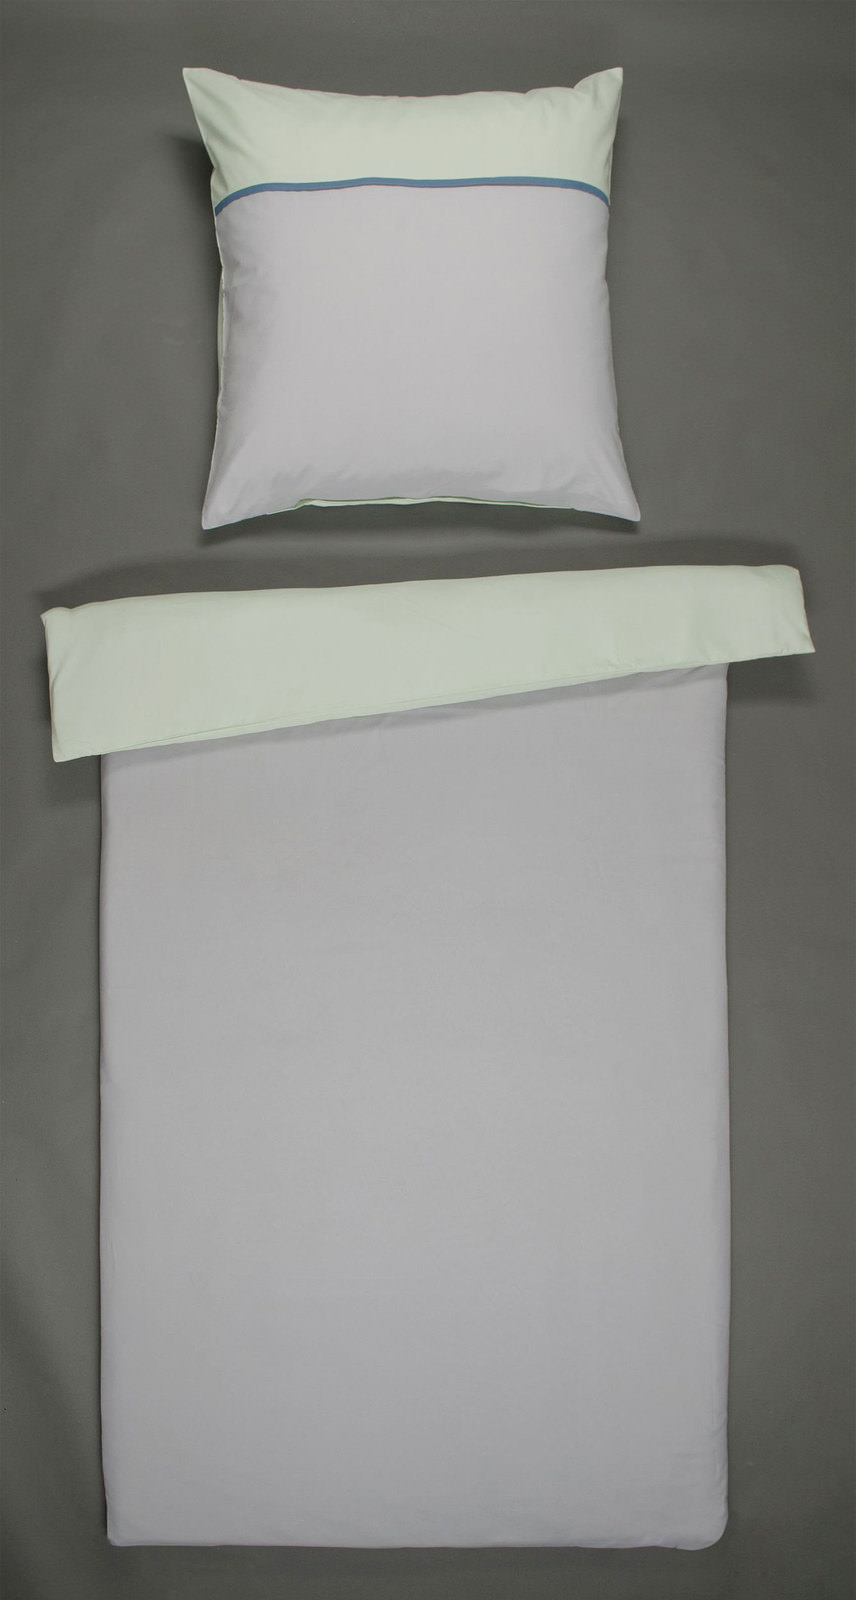 casa nova casa nova microfaser bettw online entdecken schaffrath ihr m belhaus. Black Bedroom Furniture Sets. Home Design Ideas